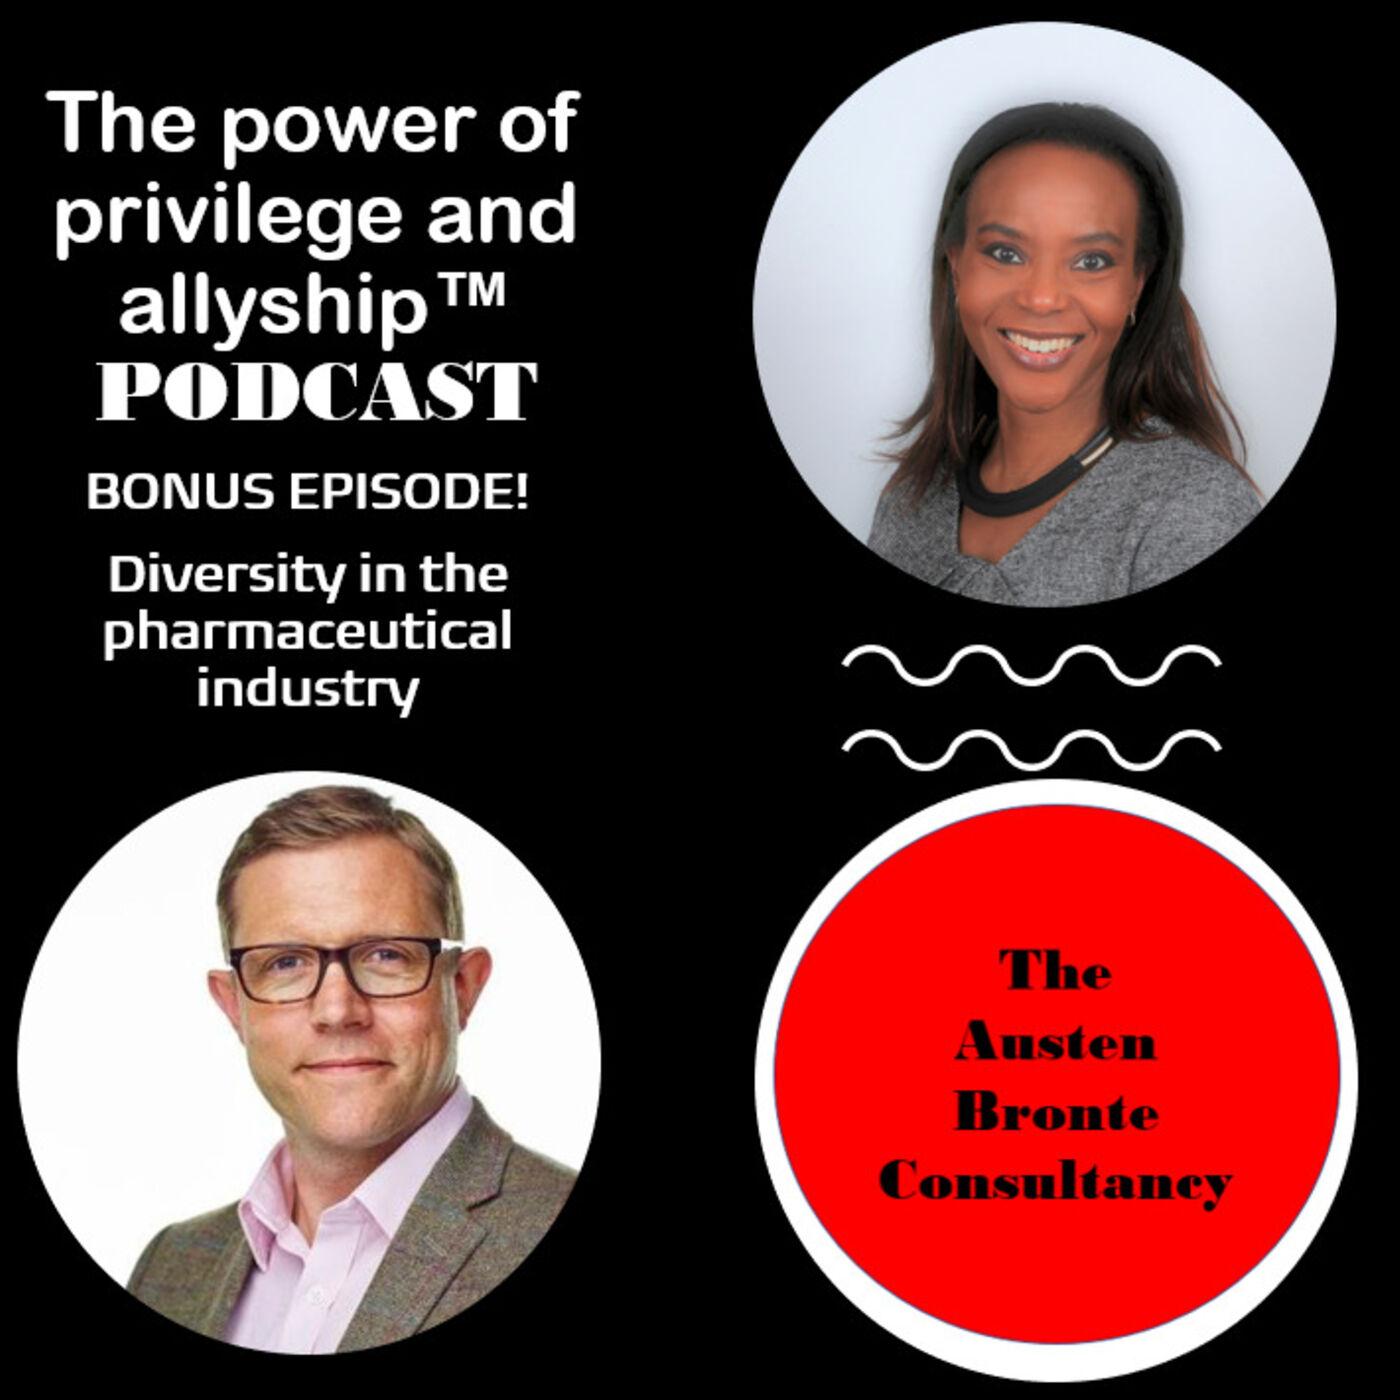 S1 BONUS EPISODE: Diversity in the pharmaceutical industry feat. Owen Marks